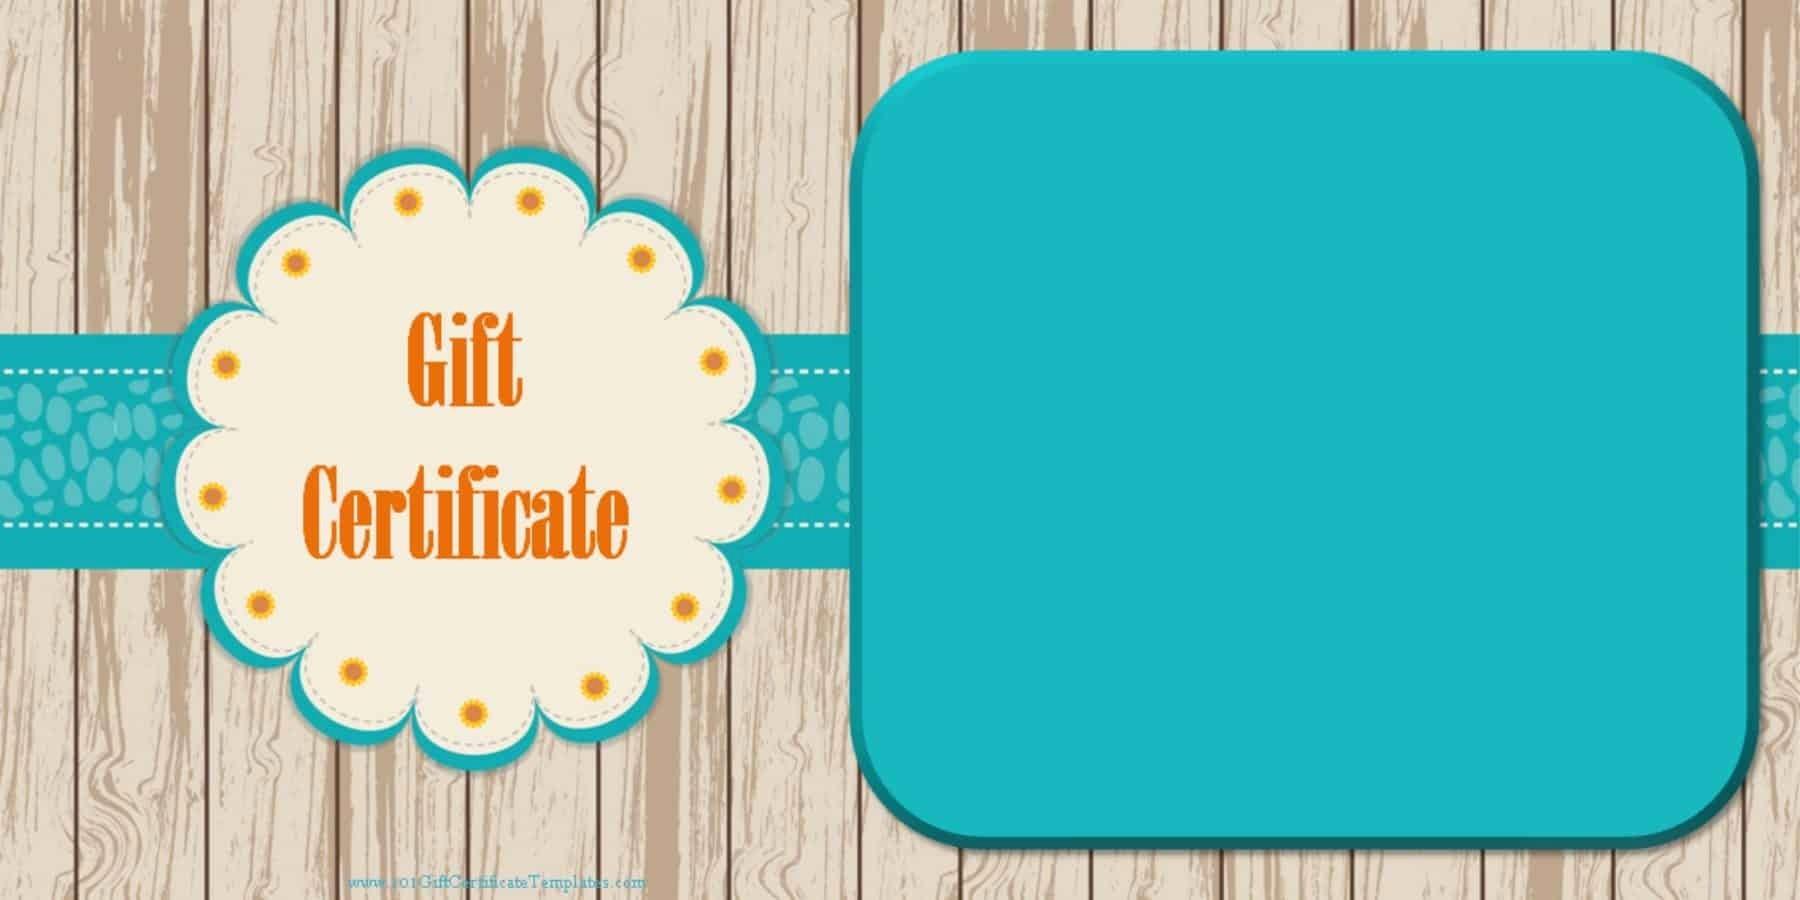 Generic Gift Certificate Template Free Luxury Printable Gift Certificate Templates